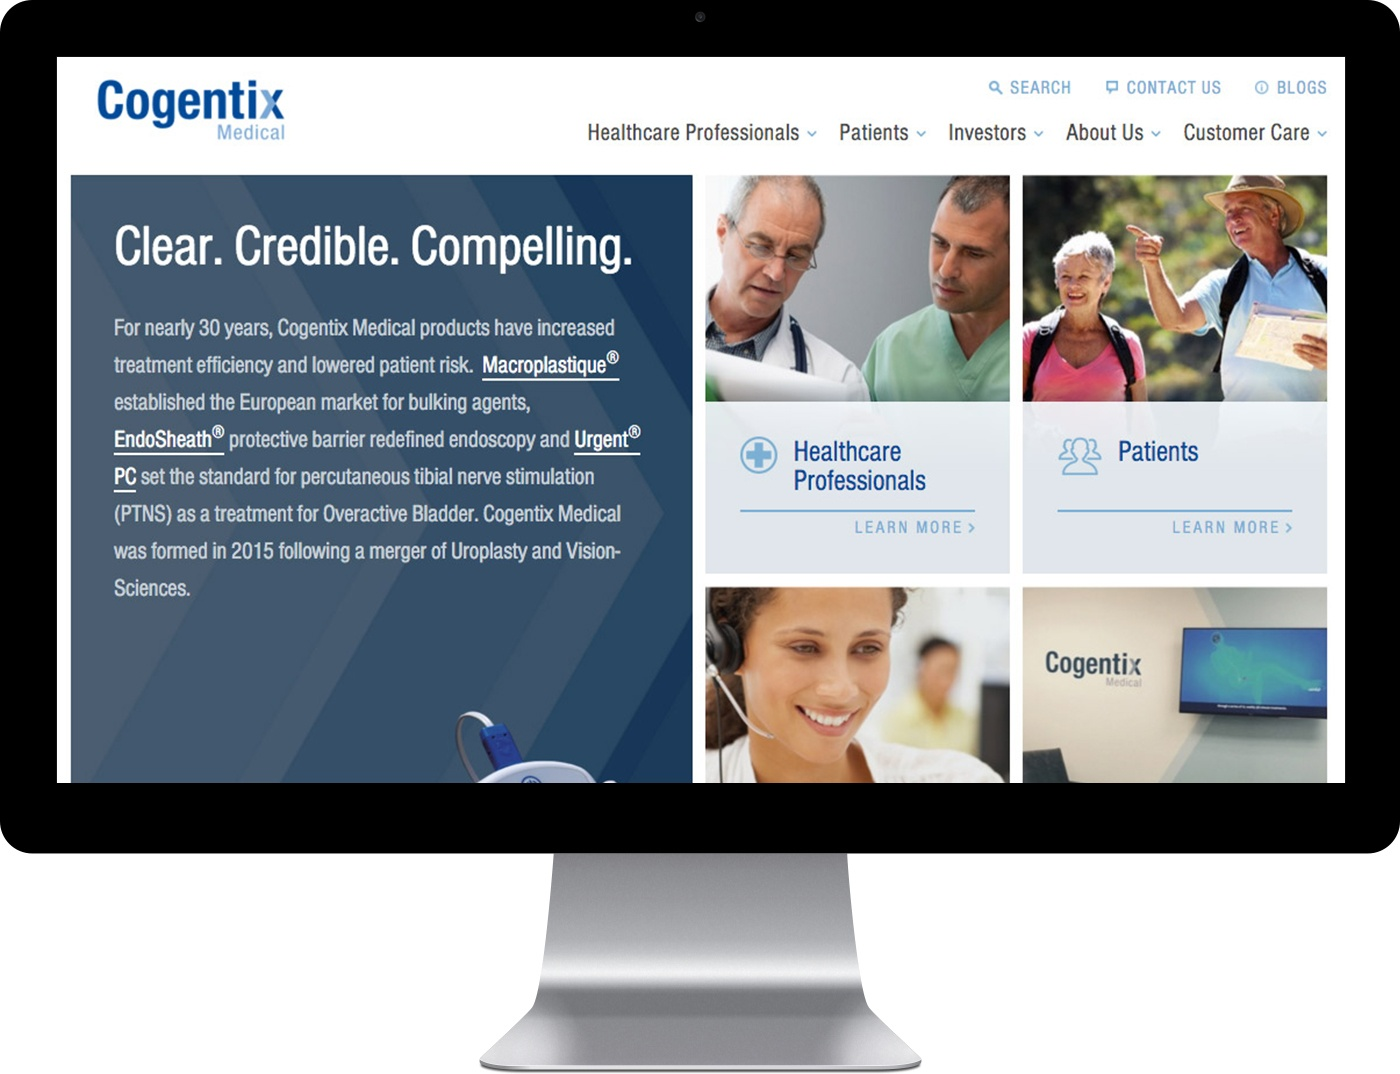 Cogentix Medical website on an iMac